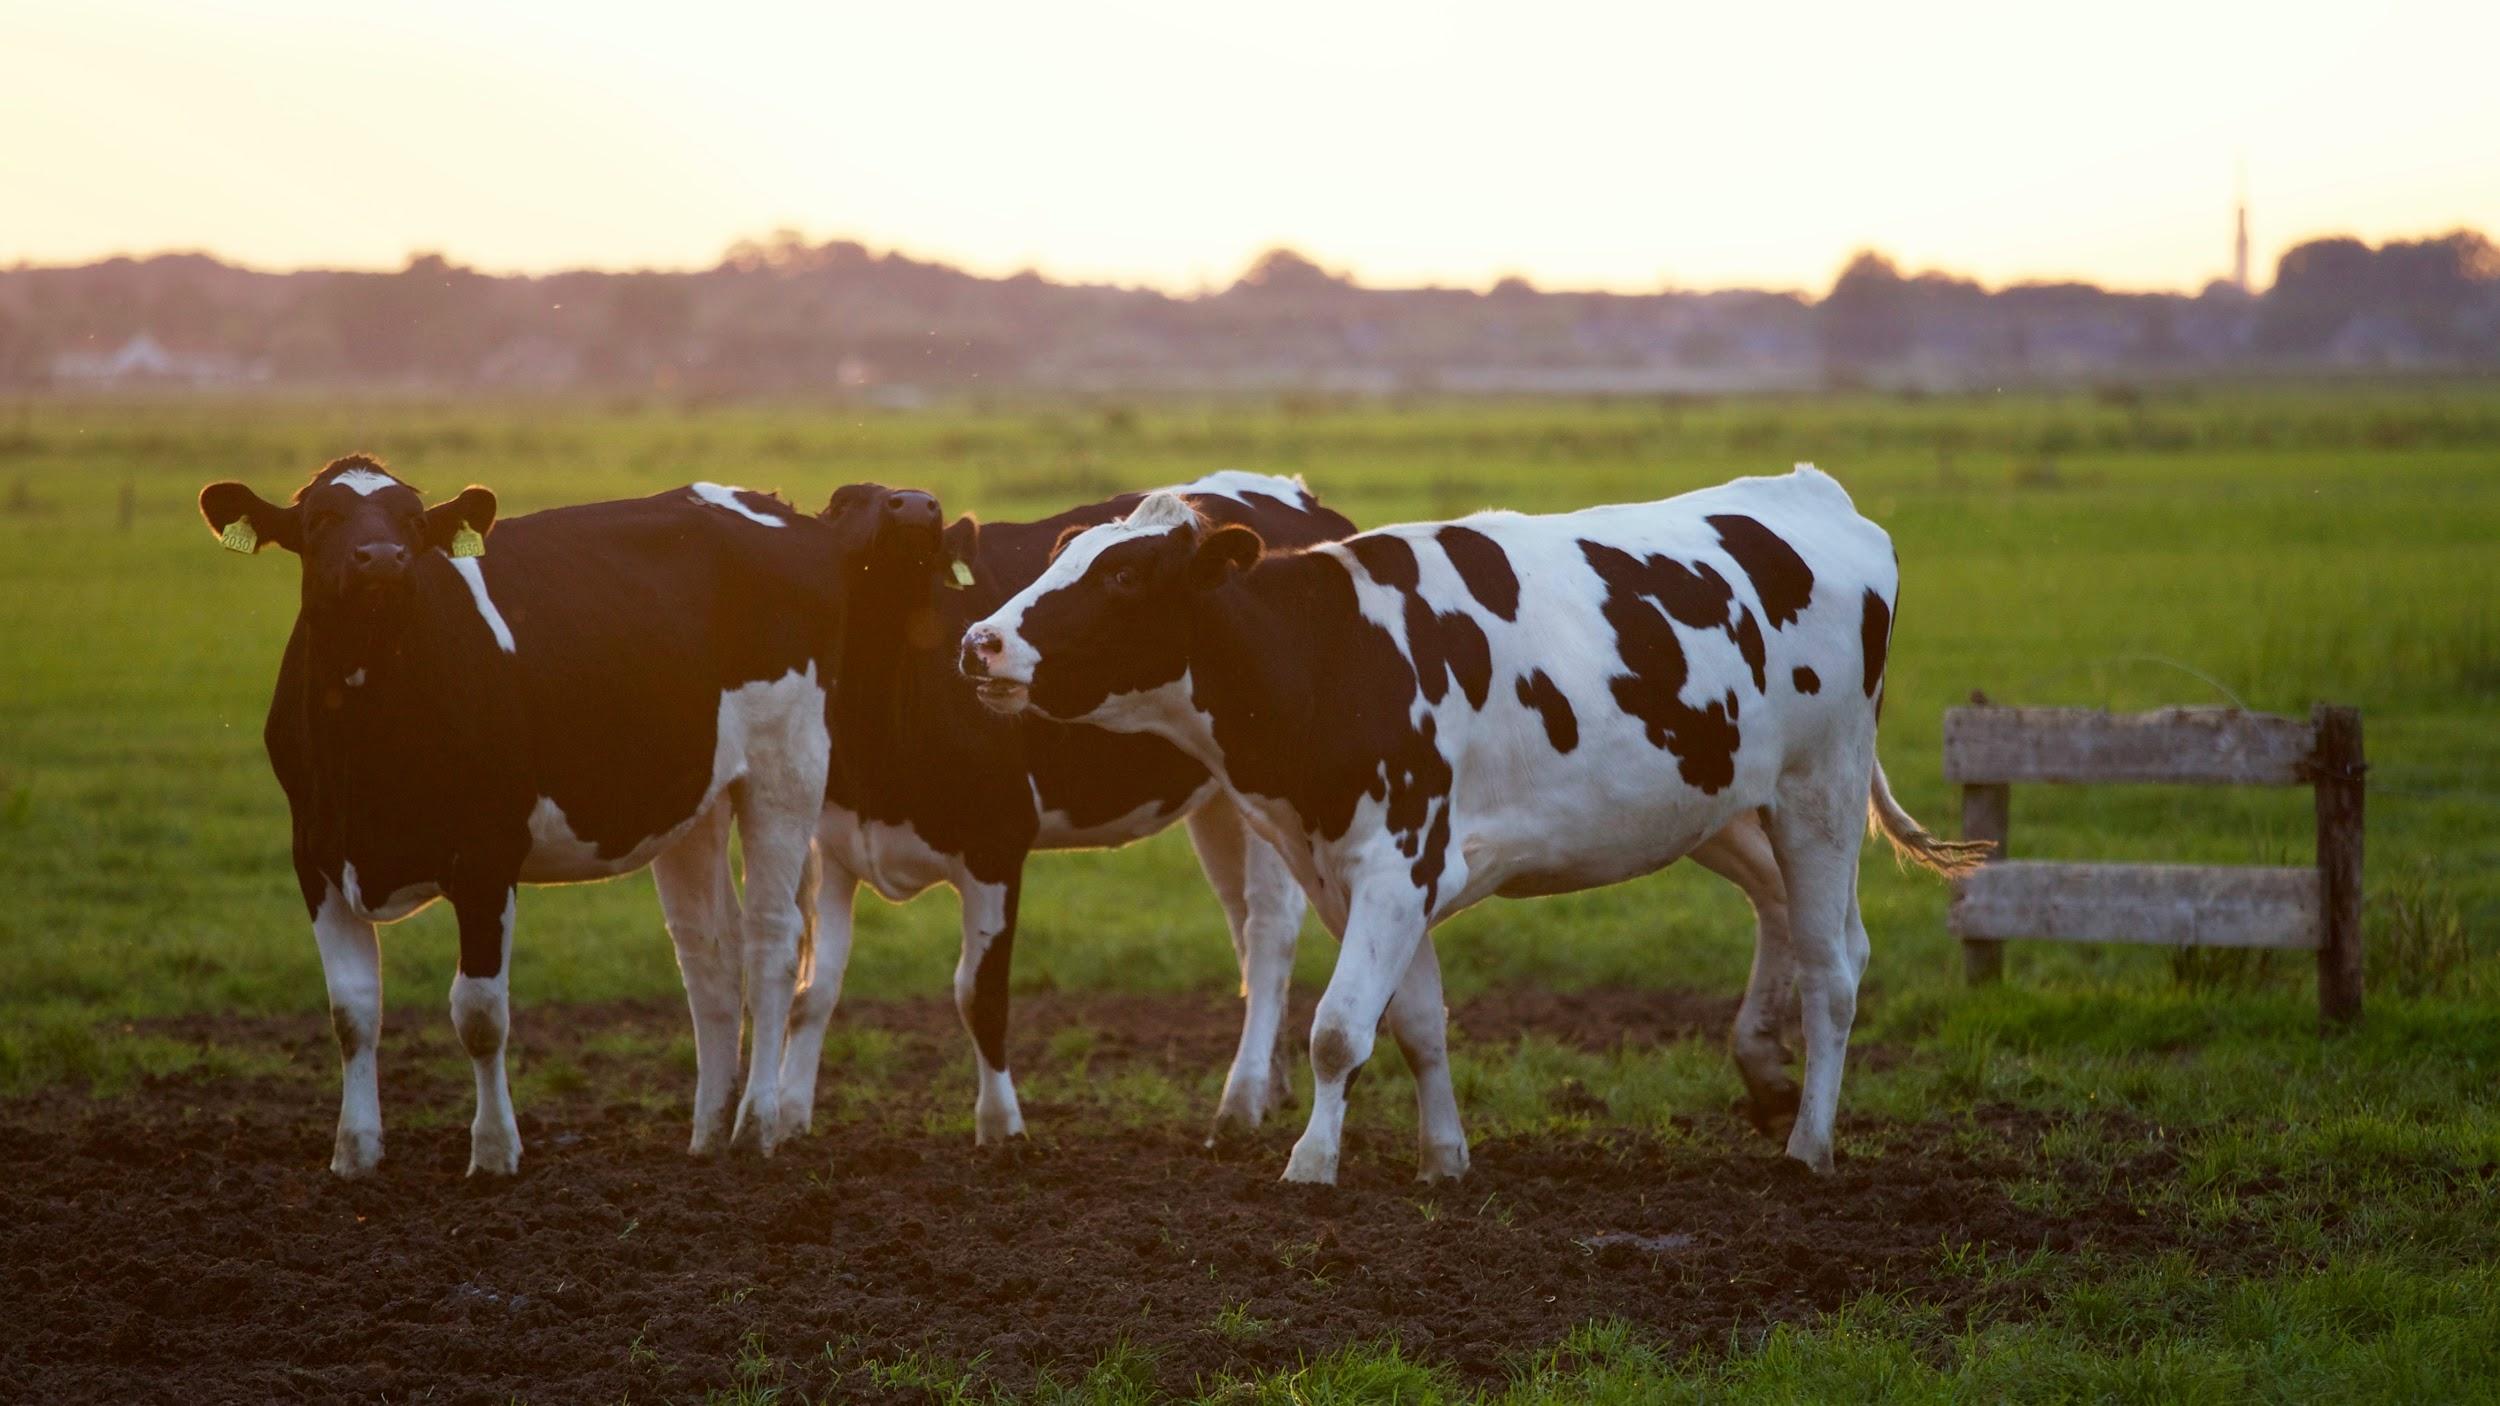 three cows in the wide farm